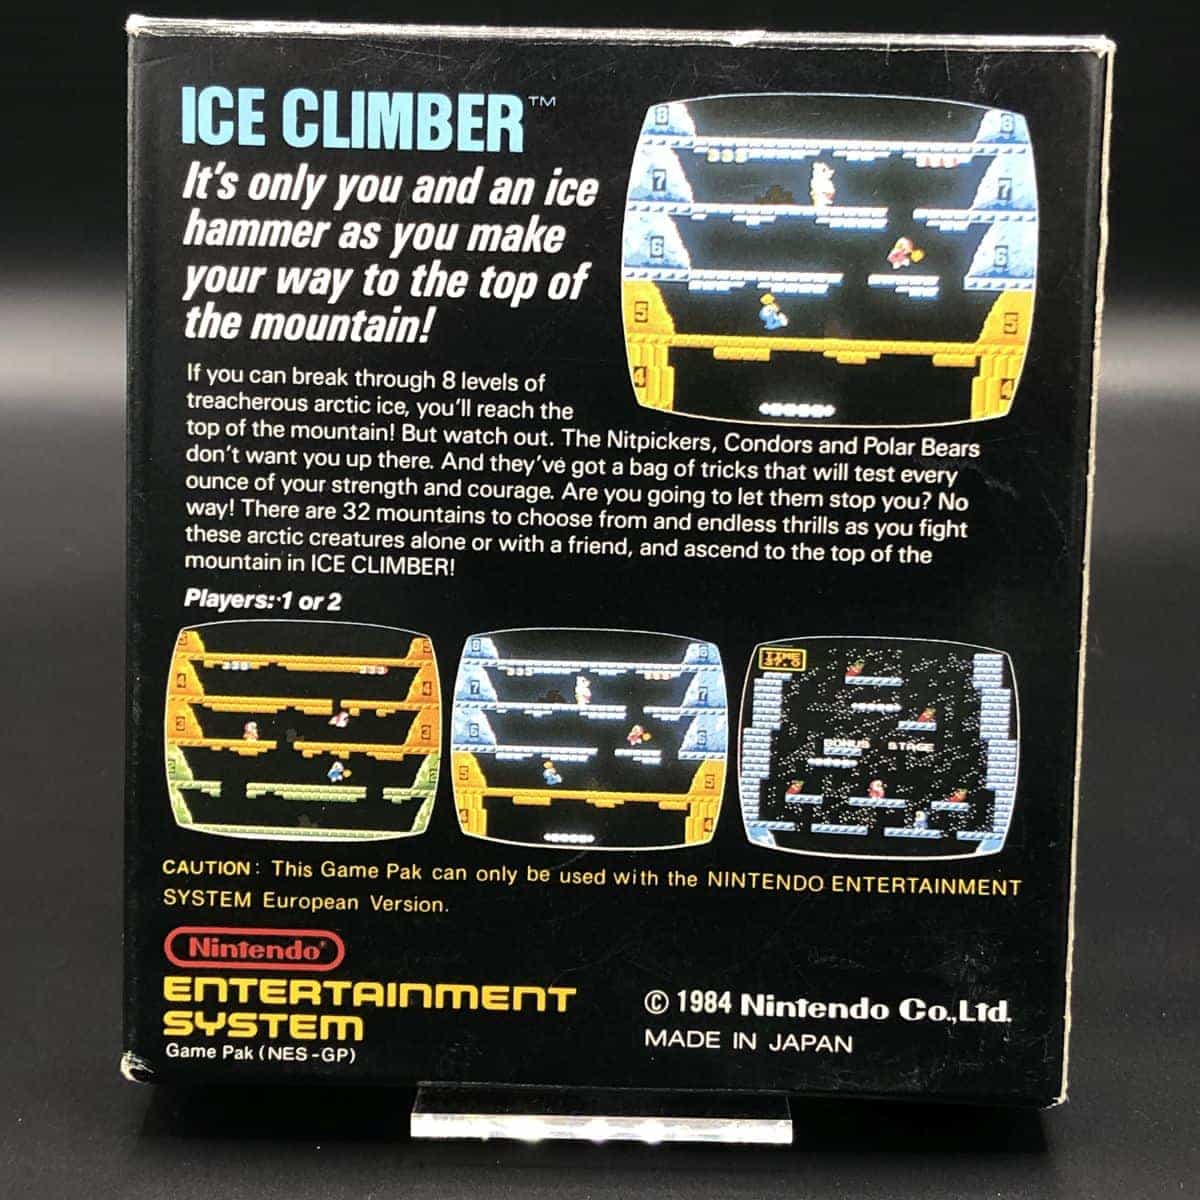 NES Ice Climber (Komplett) (Gut) Nintendo Entertainment System